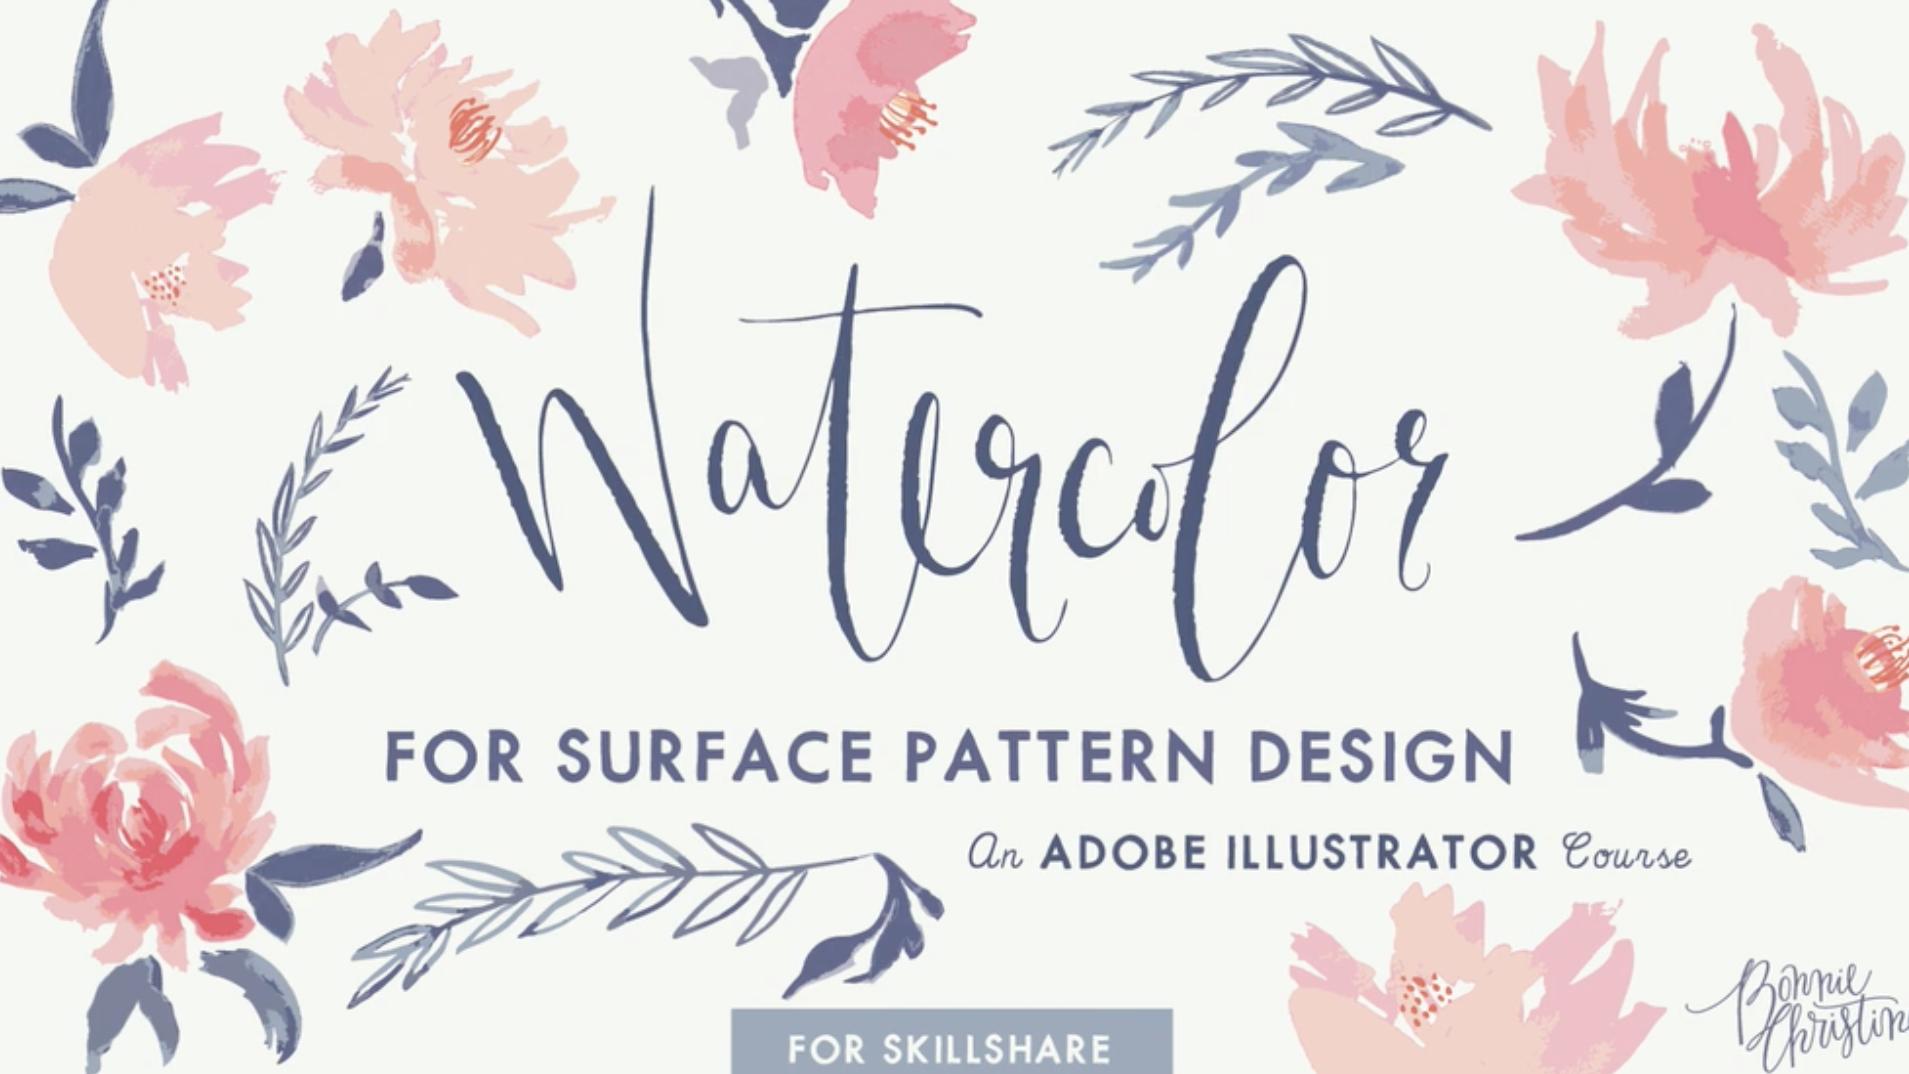 Bonnie Christine | Skillshare | Watercolor for Surface Pattern Design